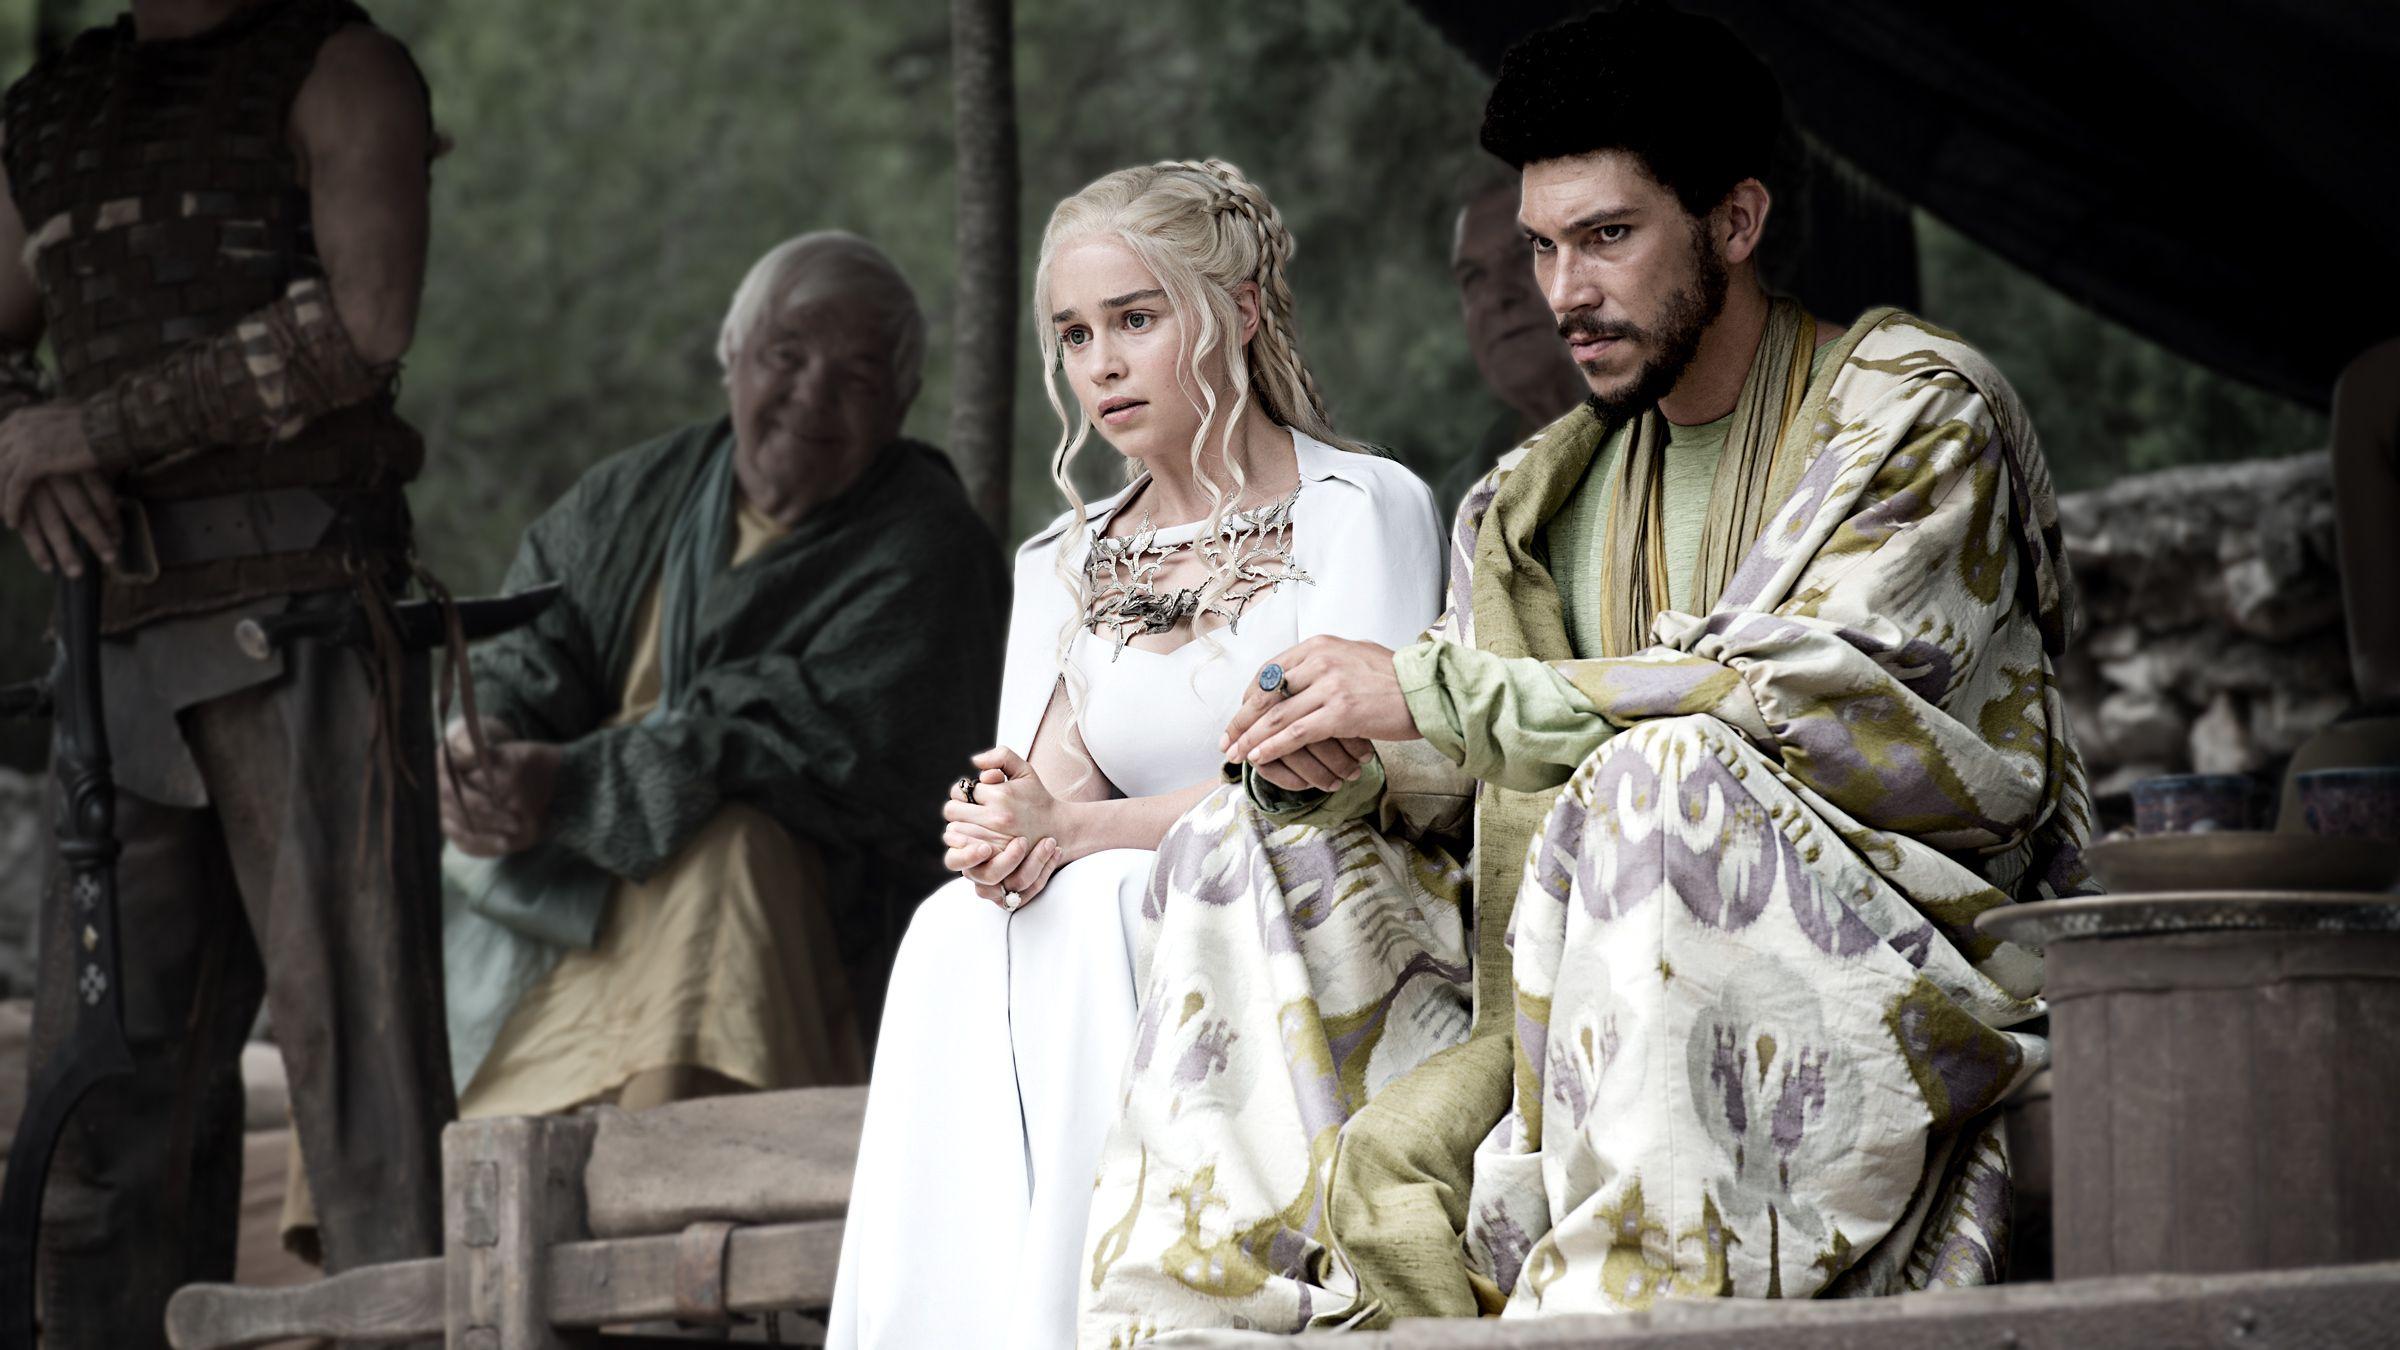 Game of Thrones Season 5 Episode 7: The Gift